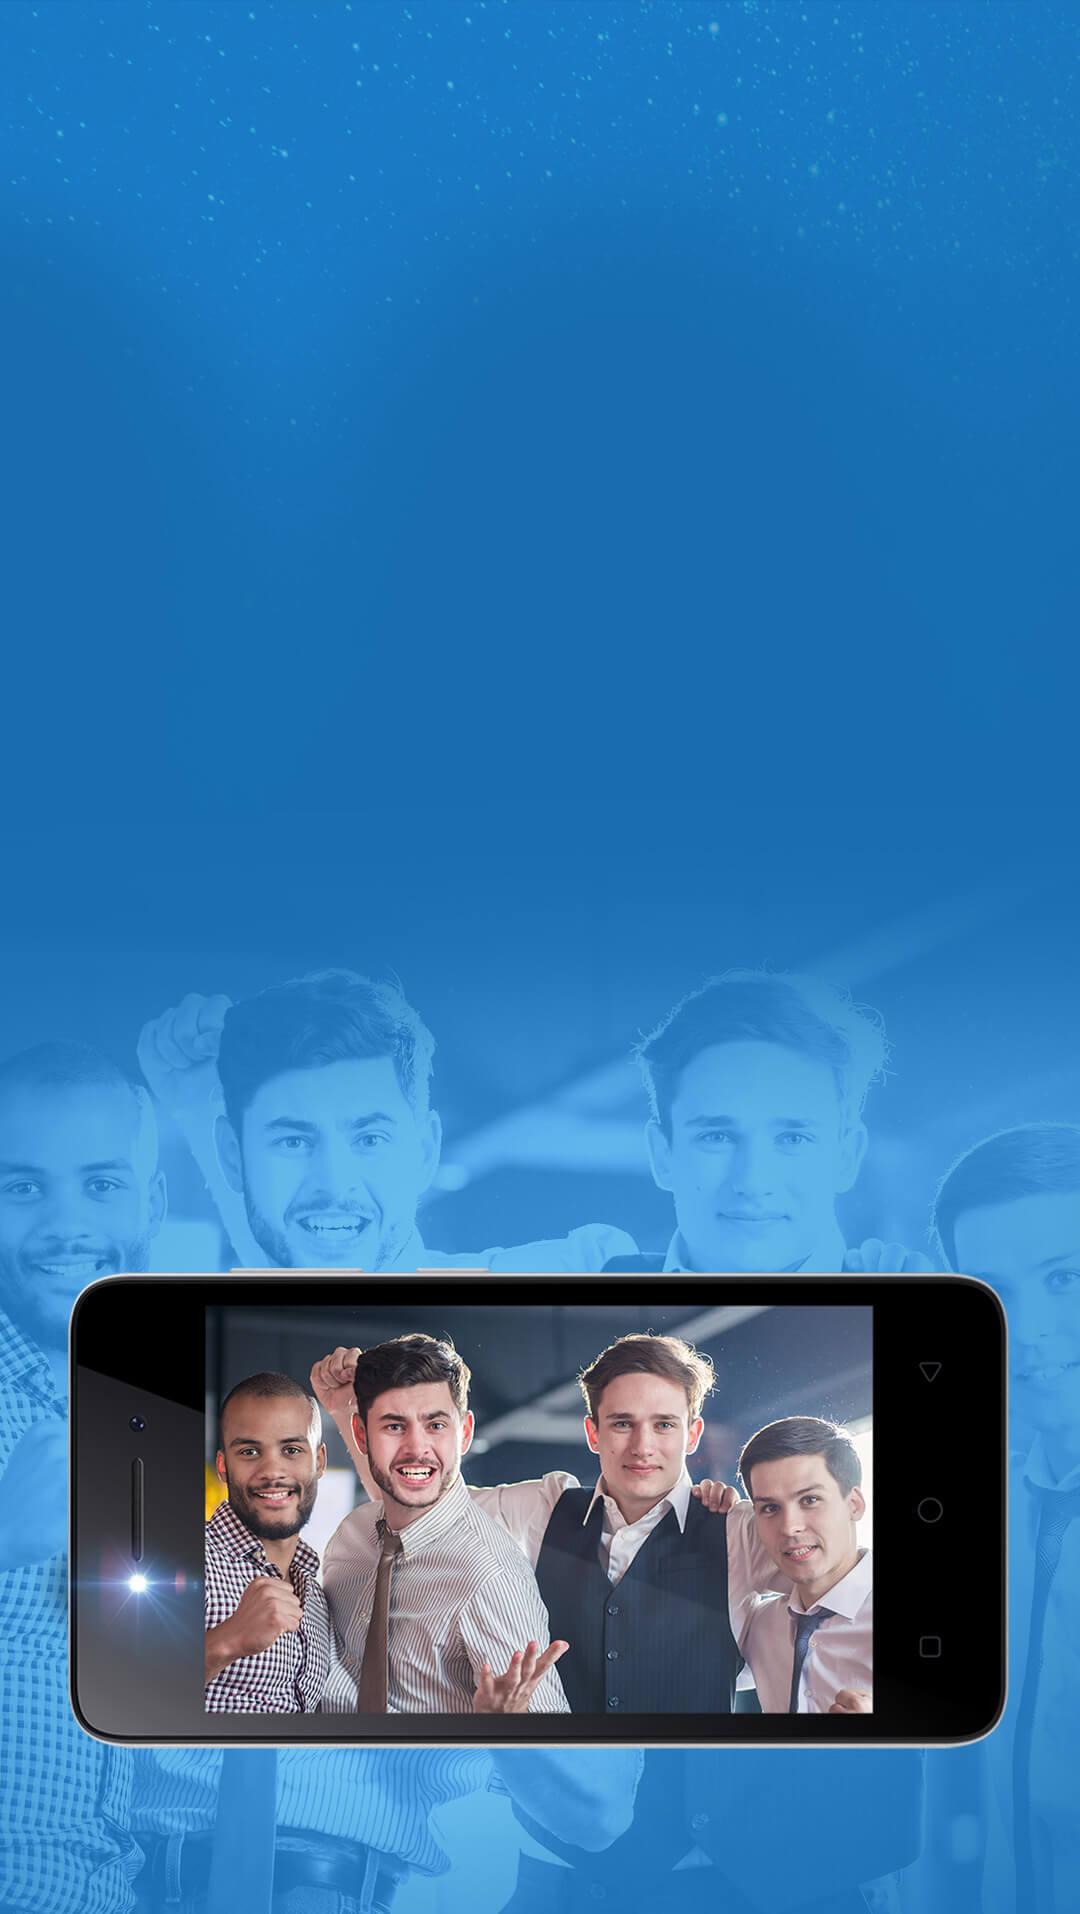 TECNO W1, Selfie, Your Lifestyle